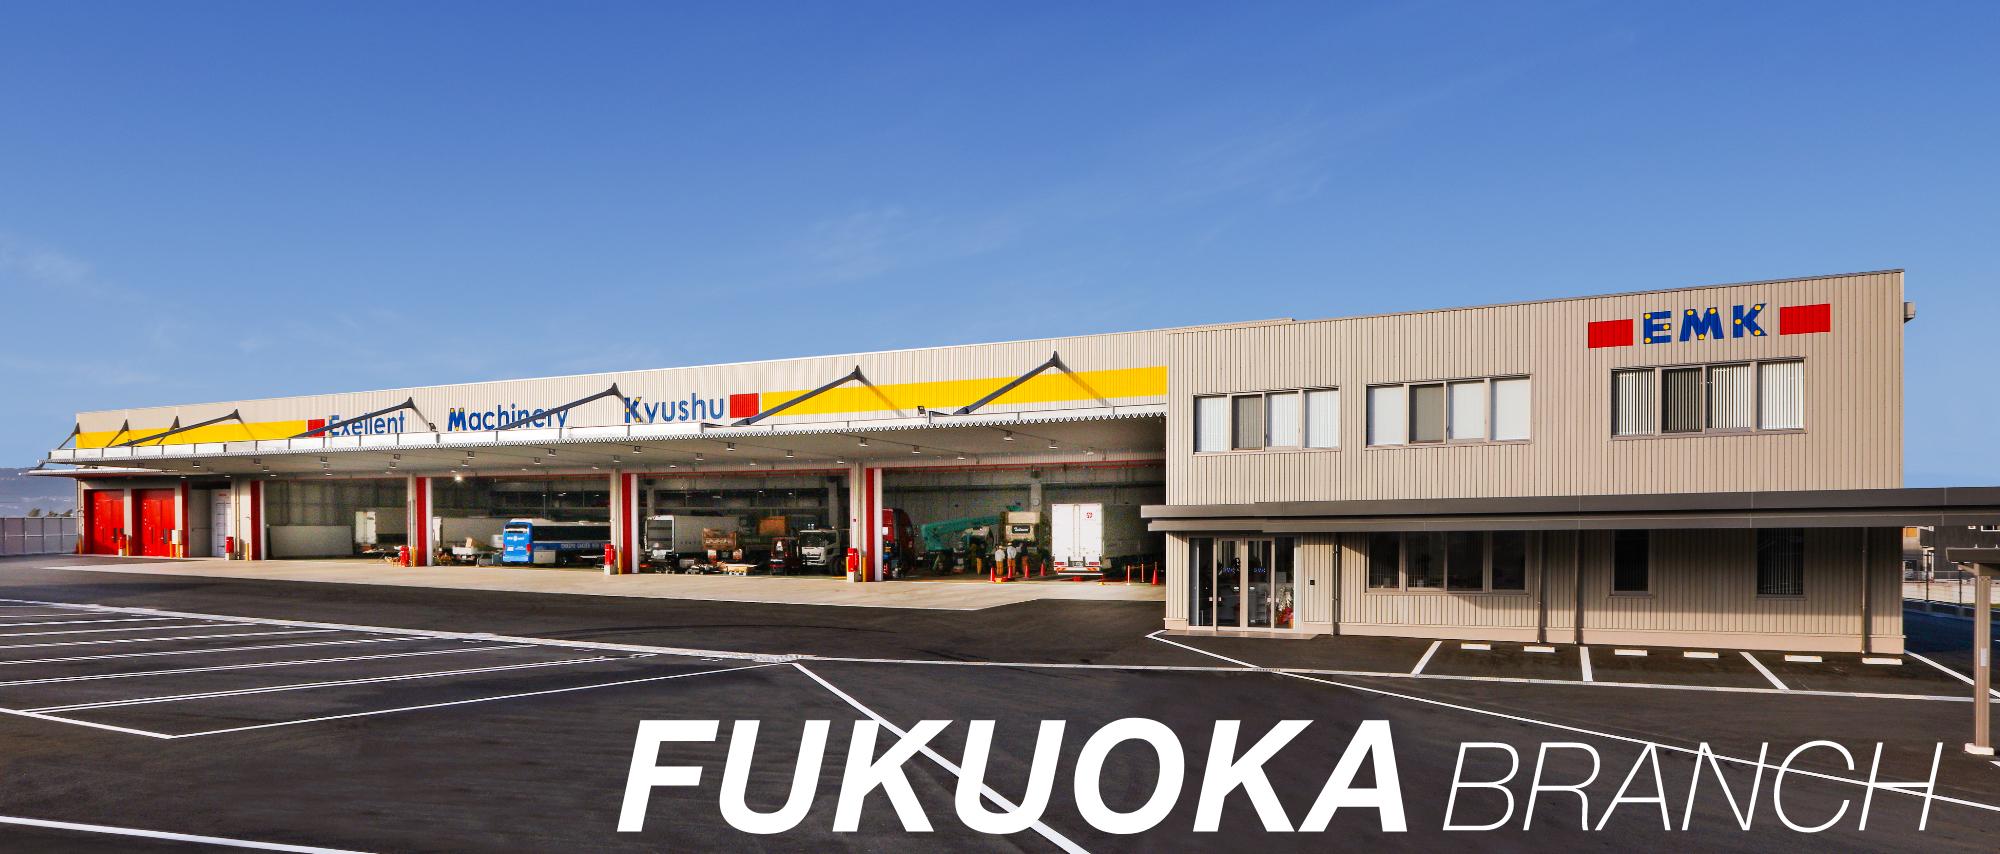 EMK 福岡支店